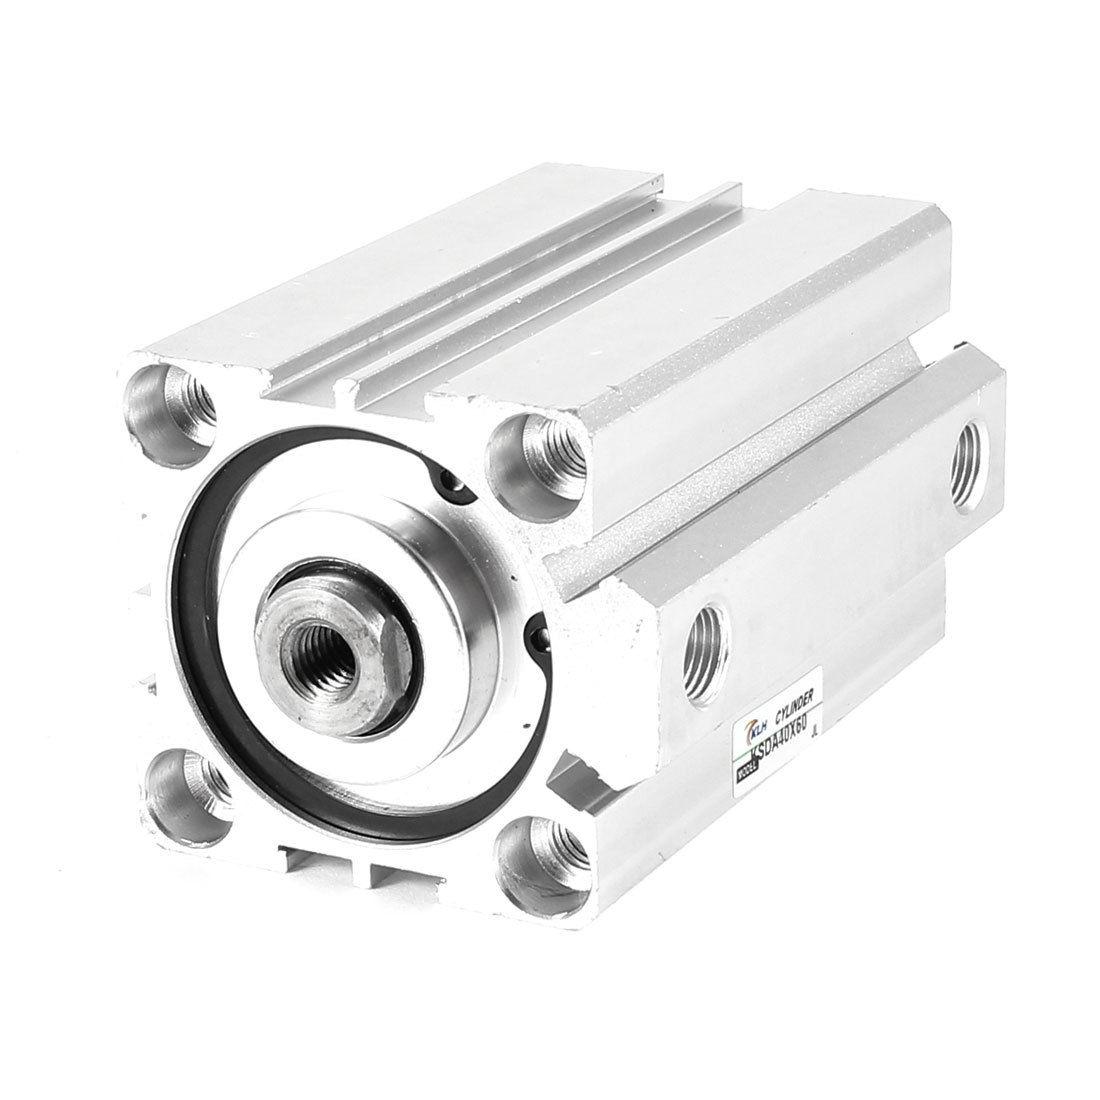 1 Pcs 50mm Bore 90mm Stroke Stainless steel Pneumatic Air Cylinder SDA50-90 1 pcs 32mm bore 75mm stroke stainless steel pneumatic air cylinder m32x75